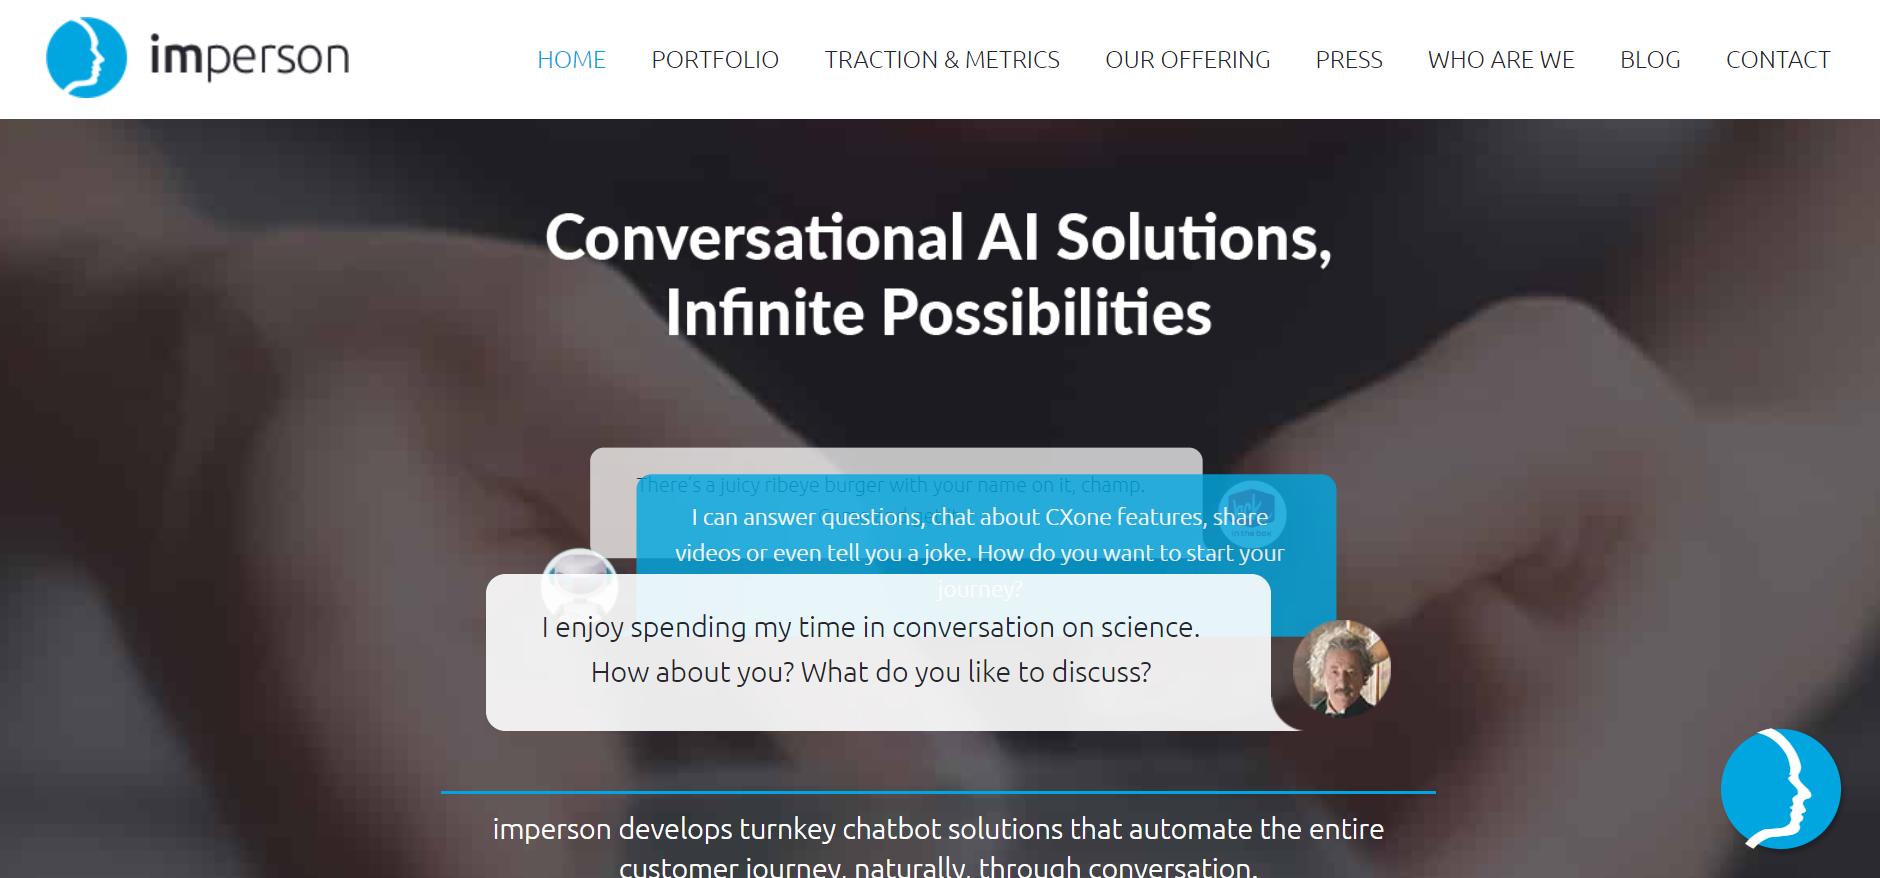 best enterprise chat software - Imperson